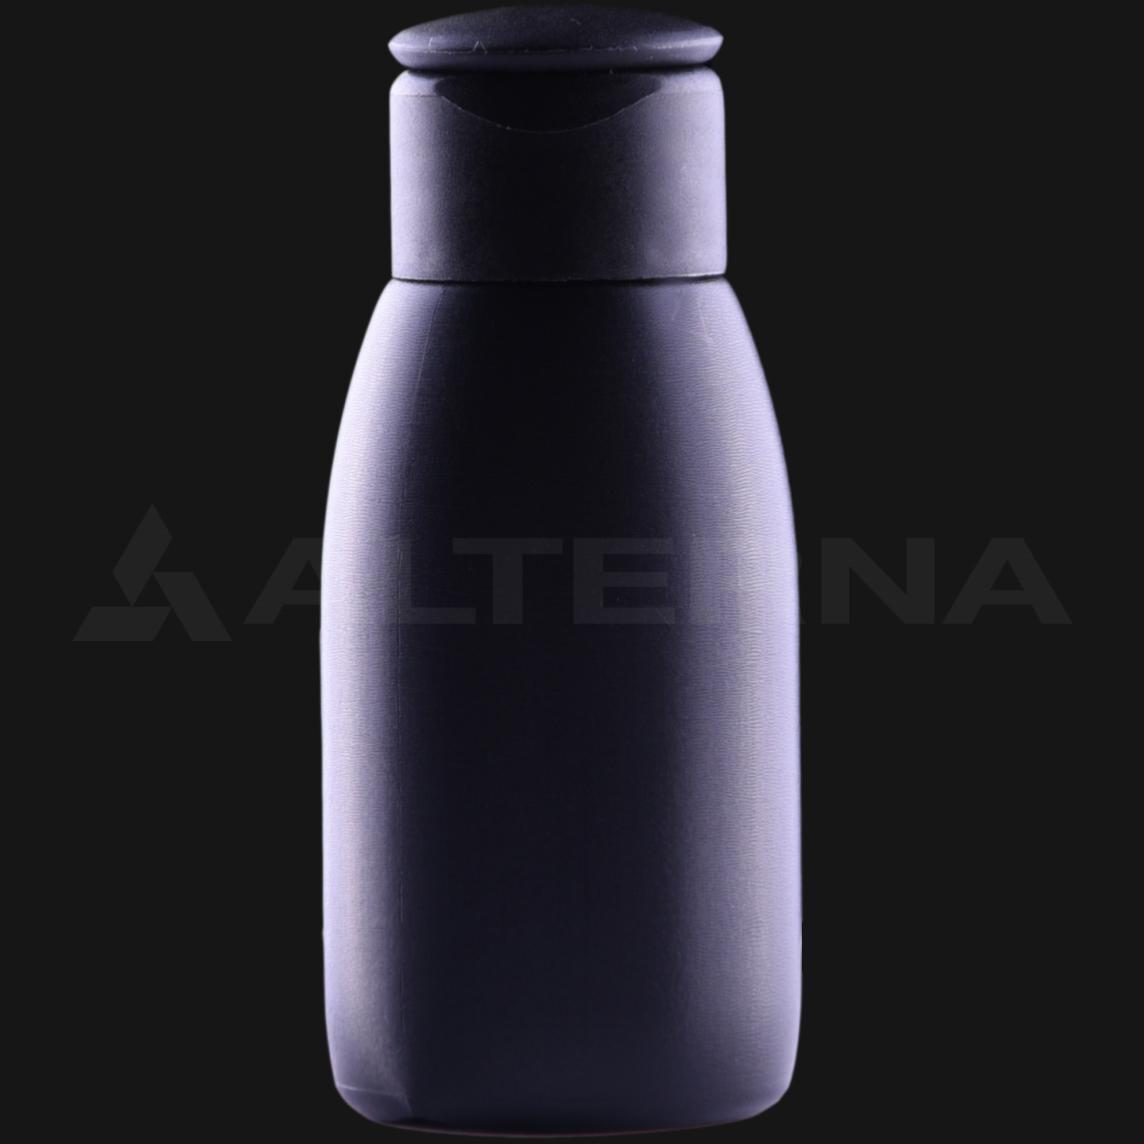 60 ml HDPE Bottle with 24 mm Flip Top Cap